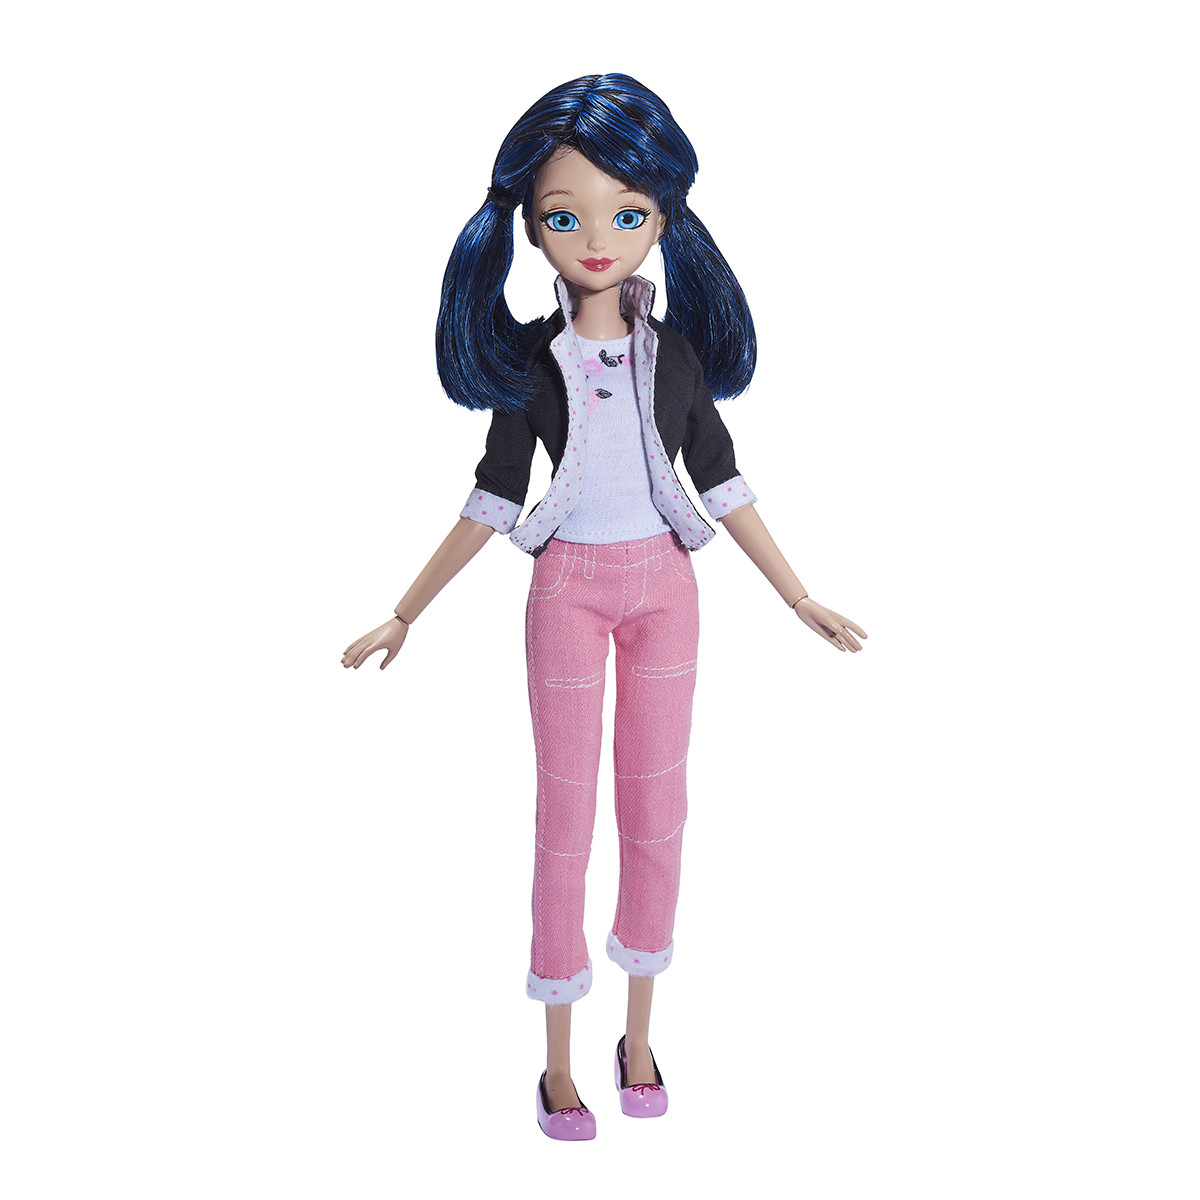 Кукла Леди Баг и Супер-кот - Маринетт серии Делюкс, 39749